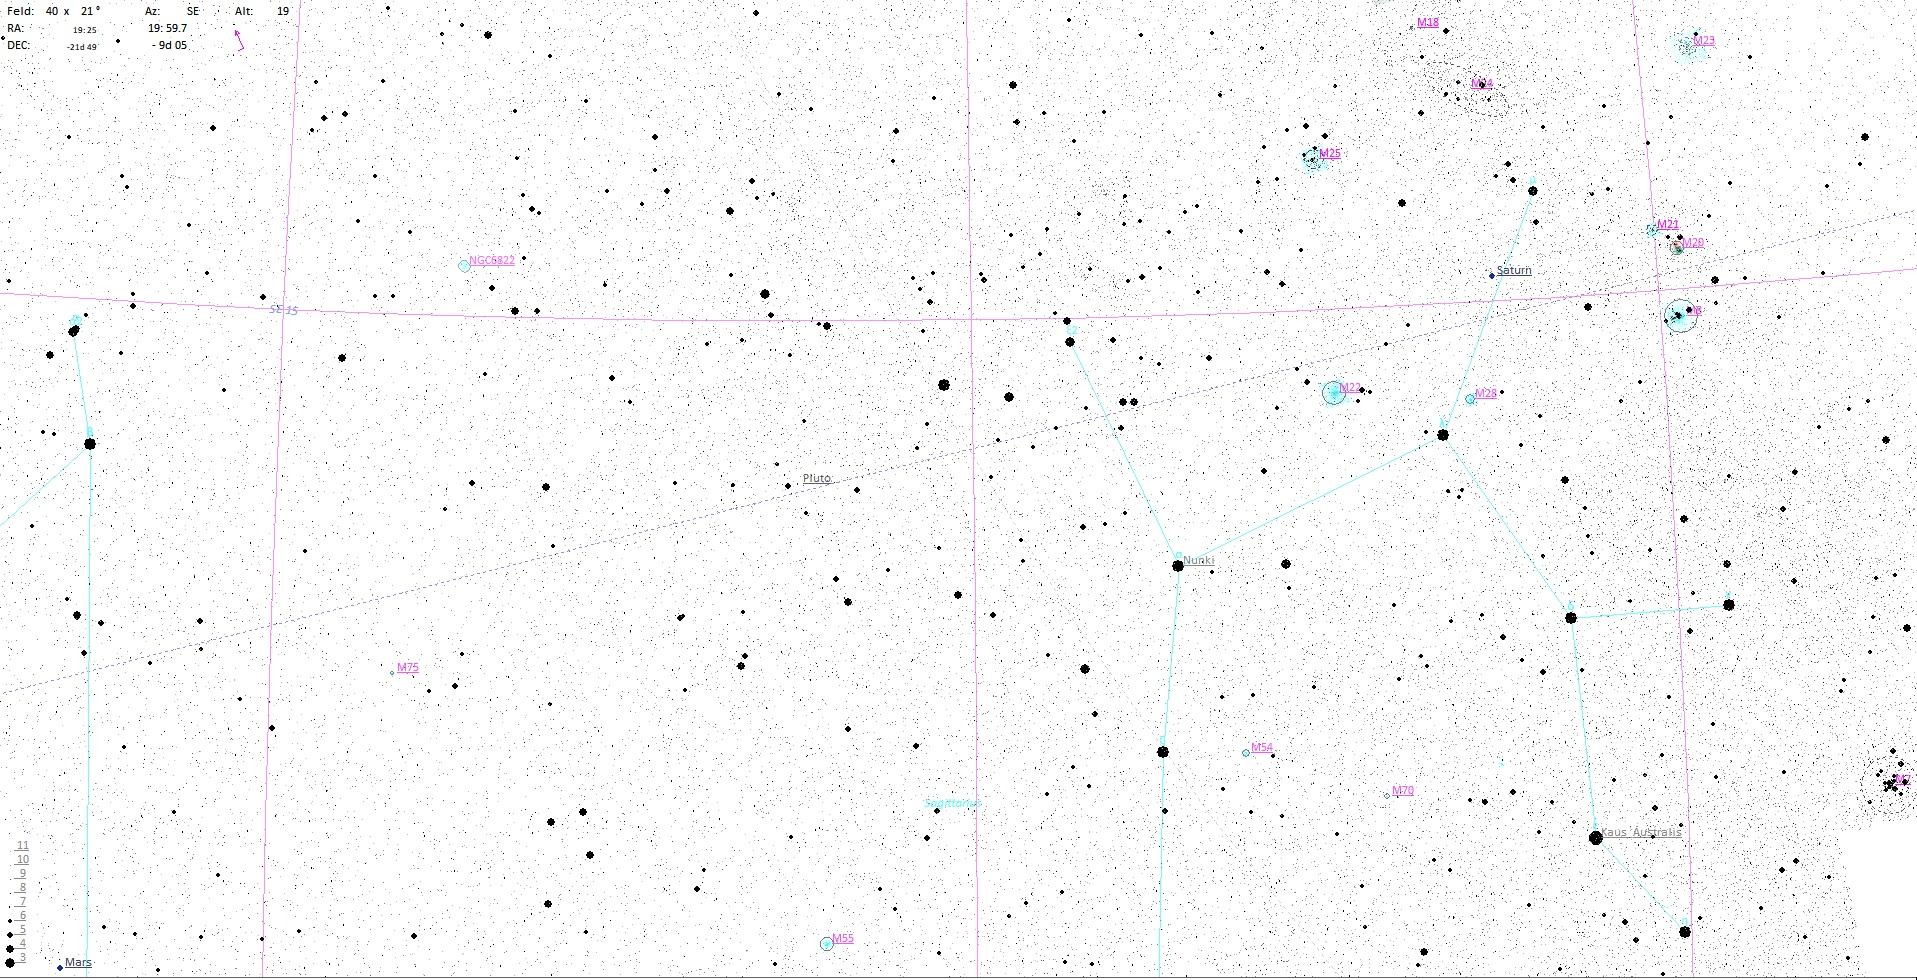 Pluto_Aufsuchkarte_HNSKY20190712_23MESZ